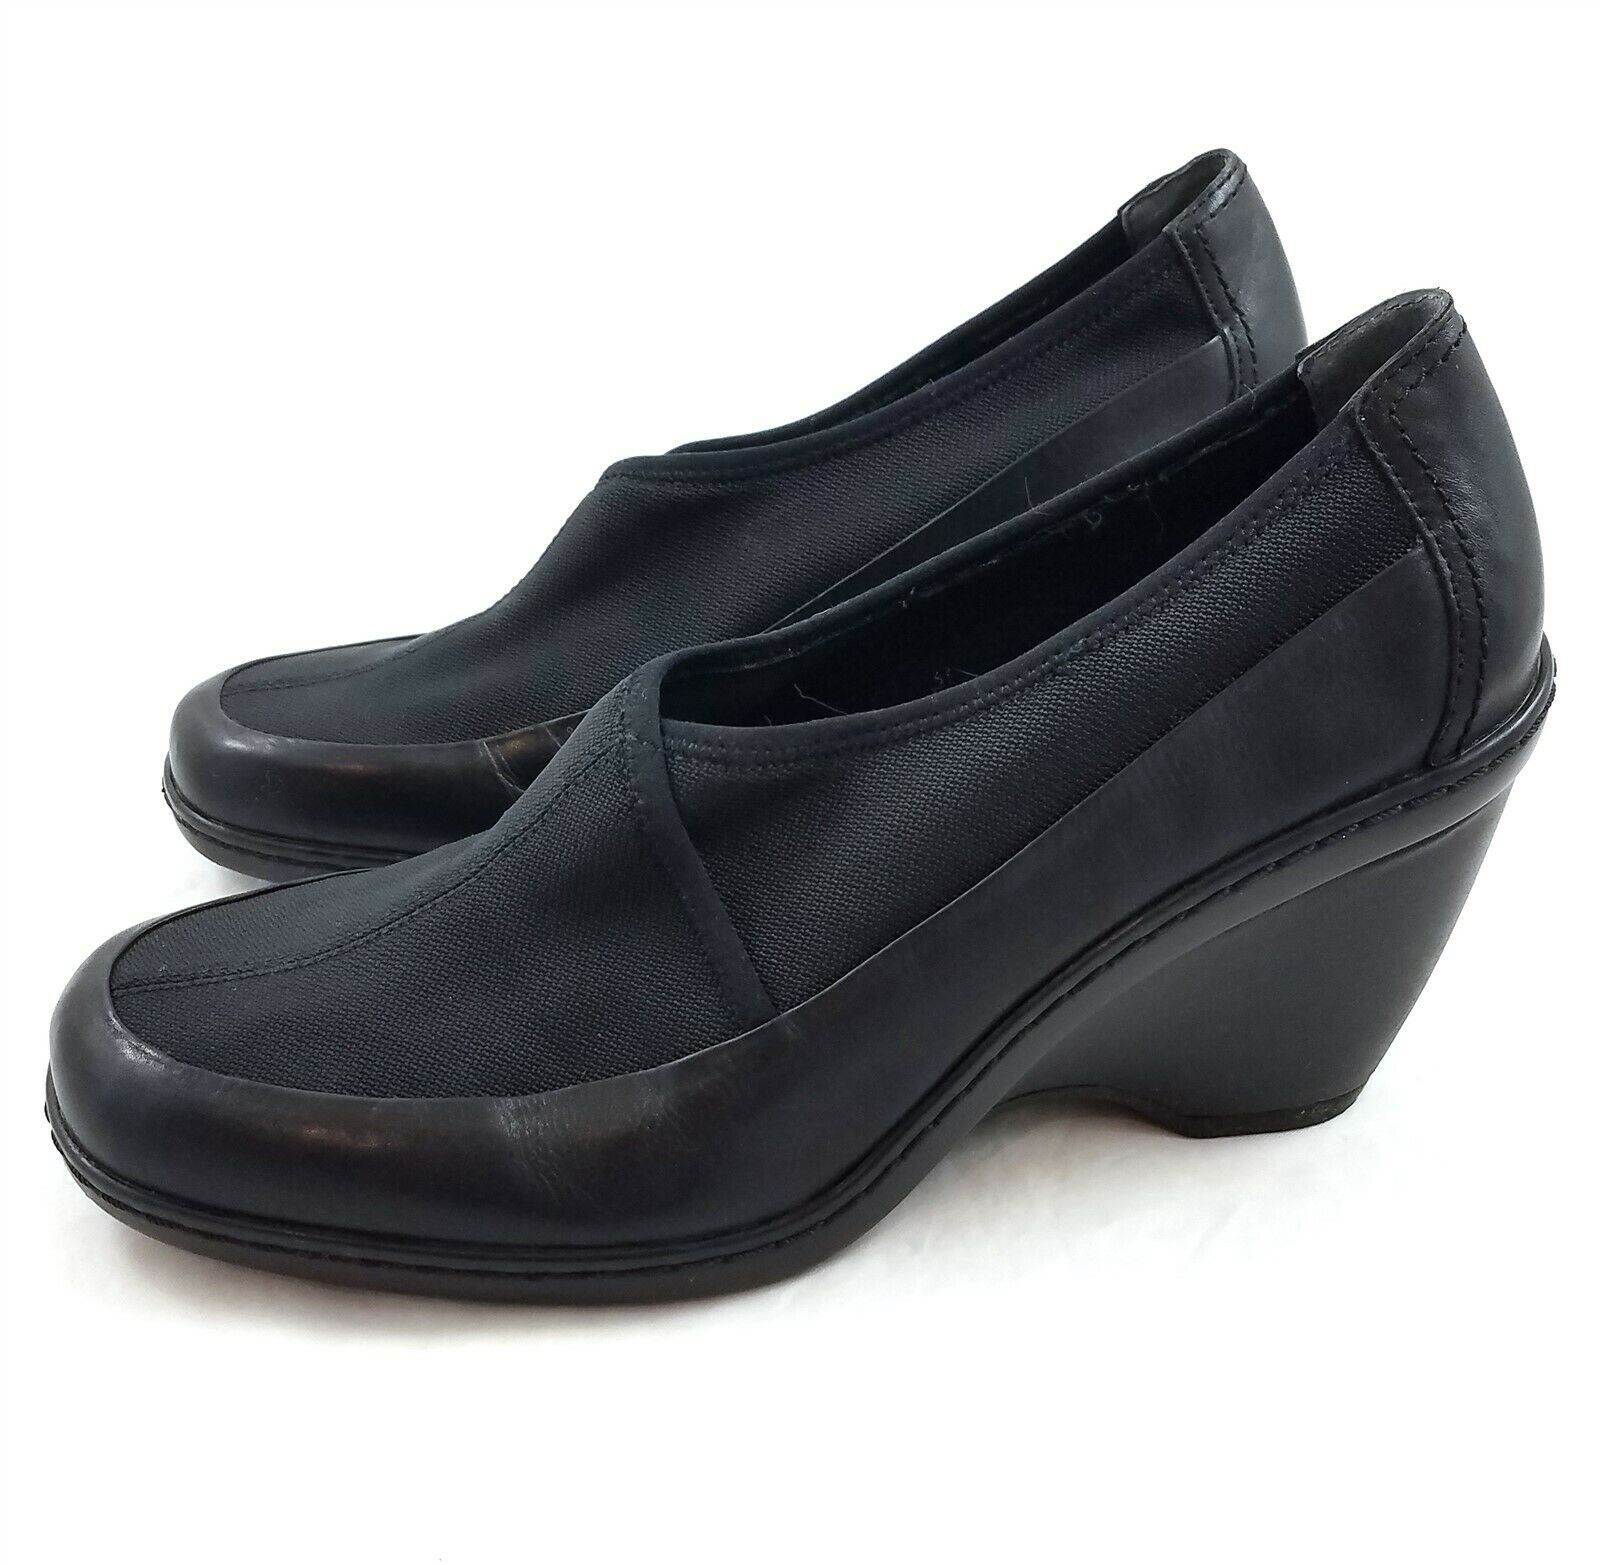 Easy Spirit Escakewalk Black Leather Textile Bootie Slip On Wedge Heels Womens 9 - $29.54